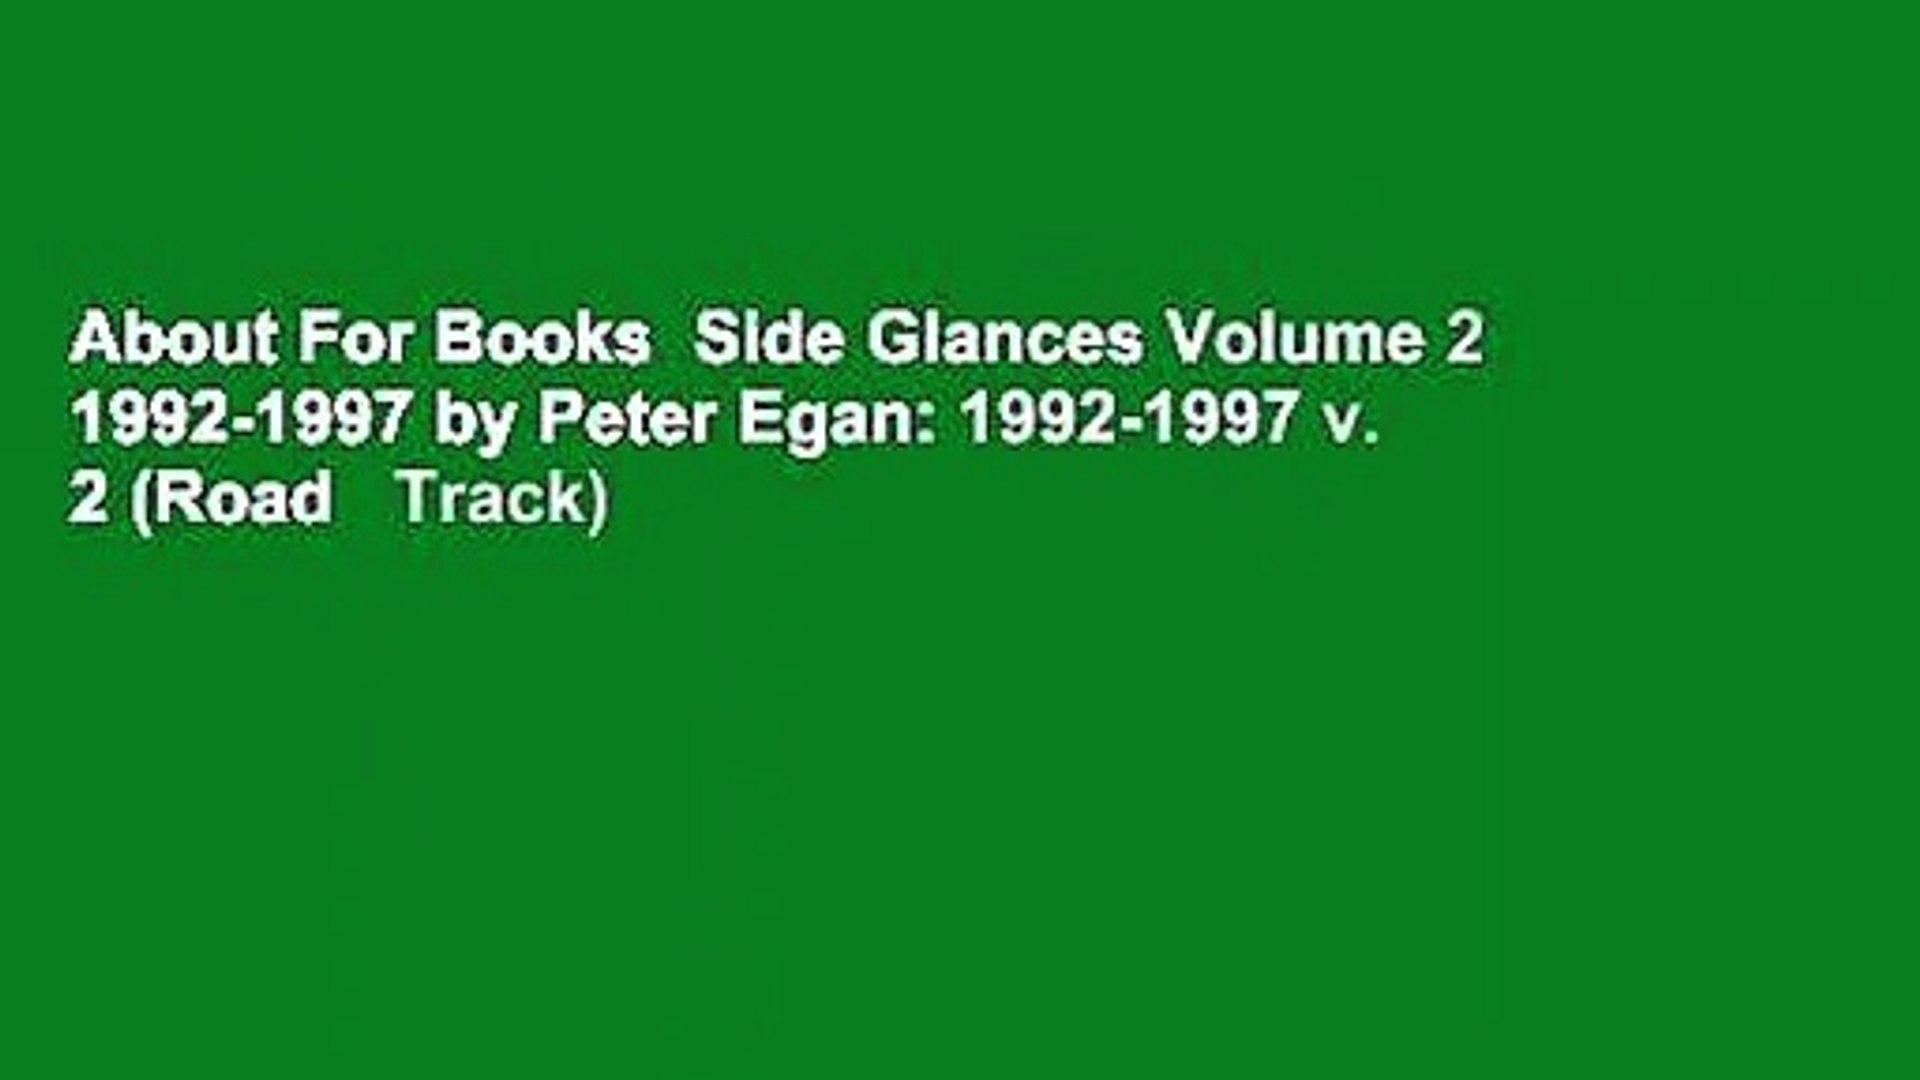 About For Books  Side Glances Volume 2 1992-1997 by Peter Egan: 1992-1997 v. 2 (Road   Track)